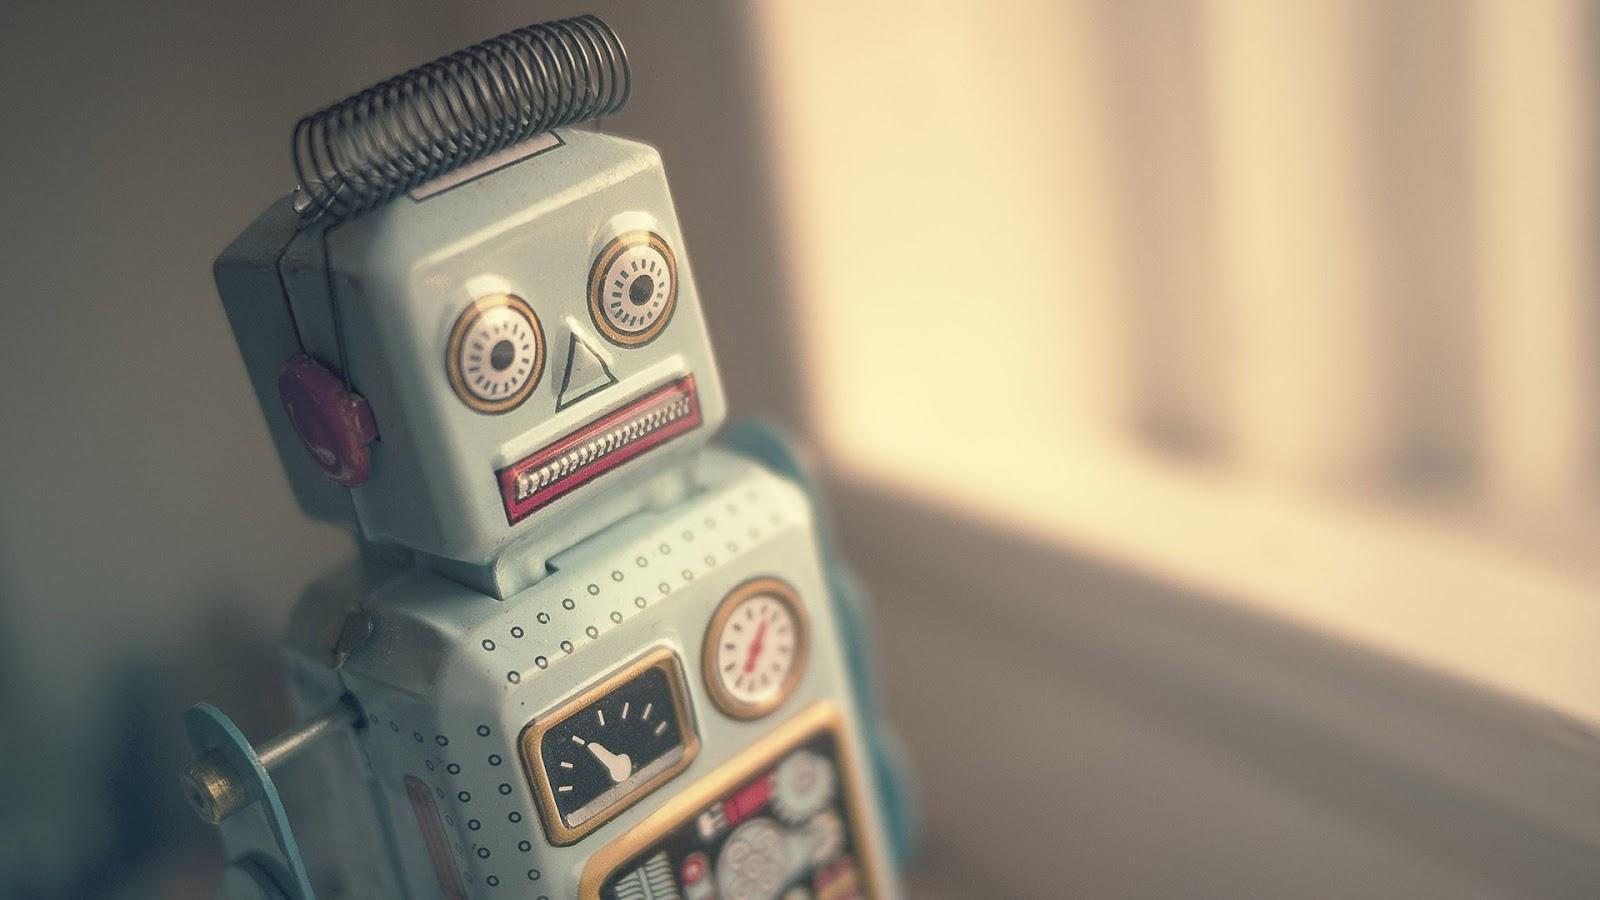 Retro Robot Desktop Wallpaper image gallery 1600x900